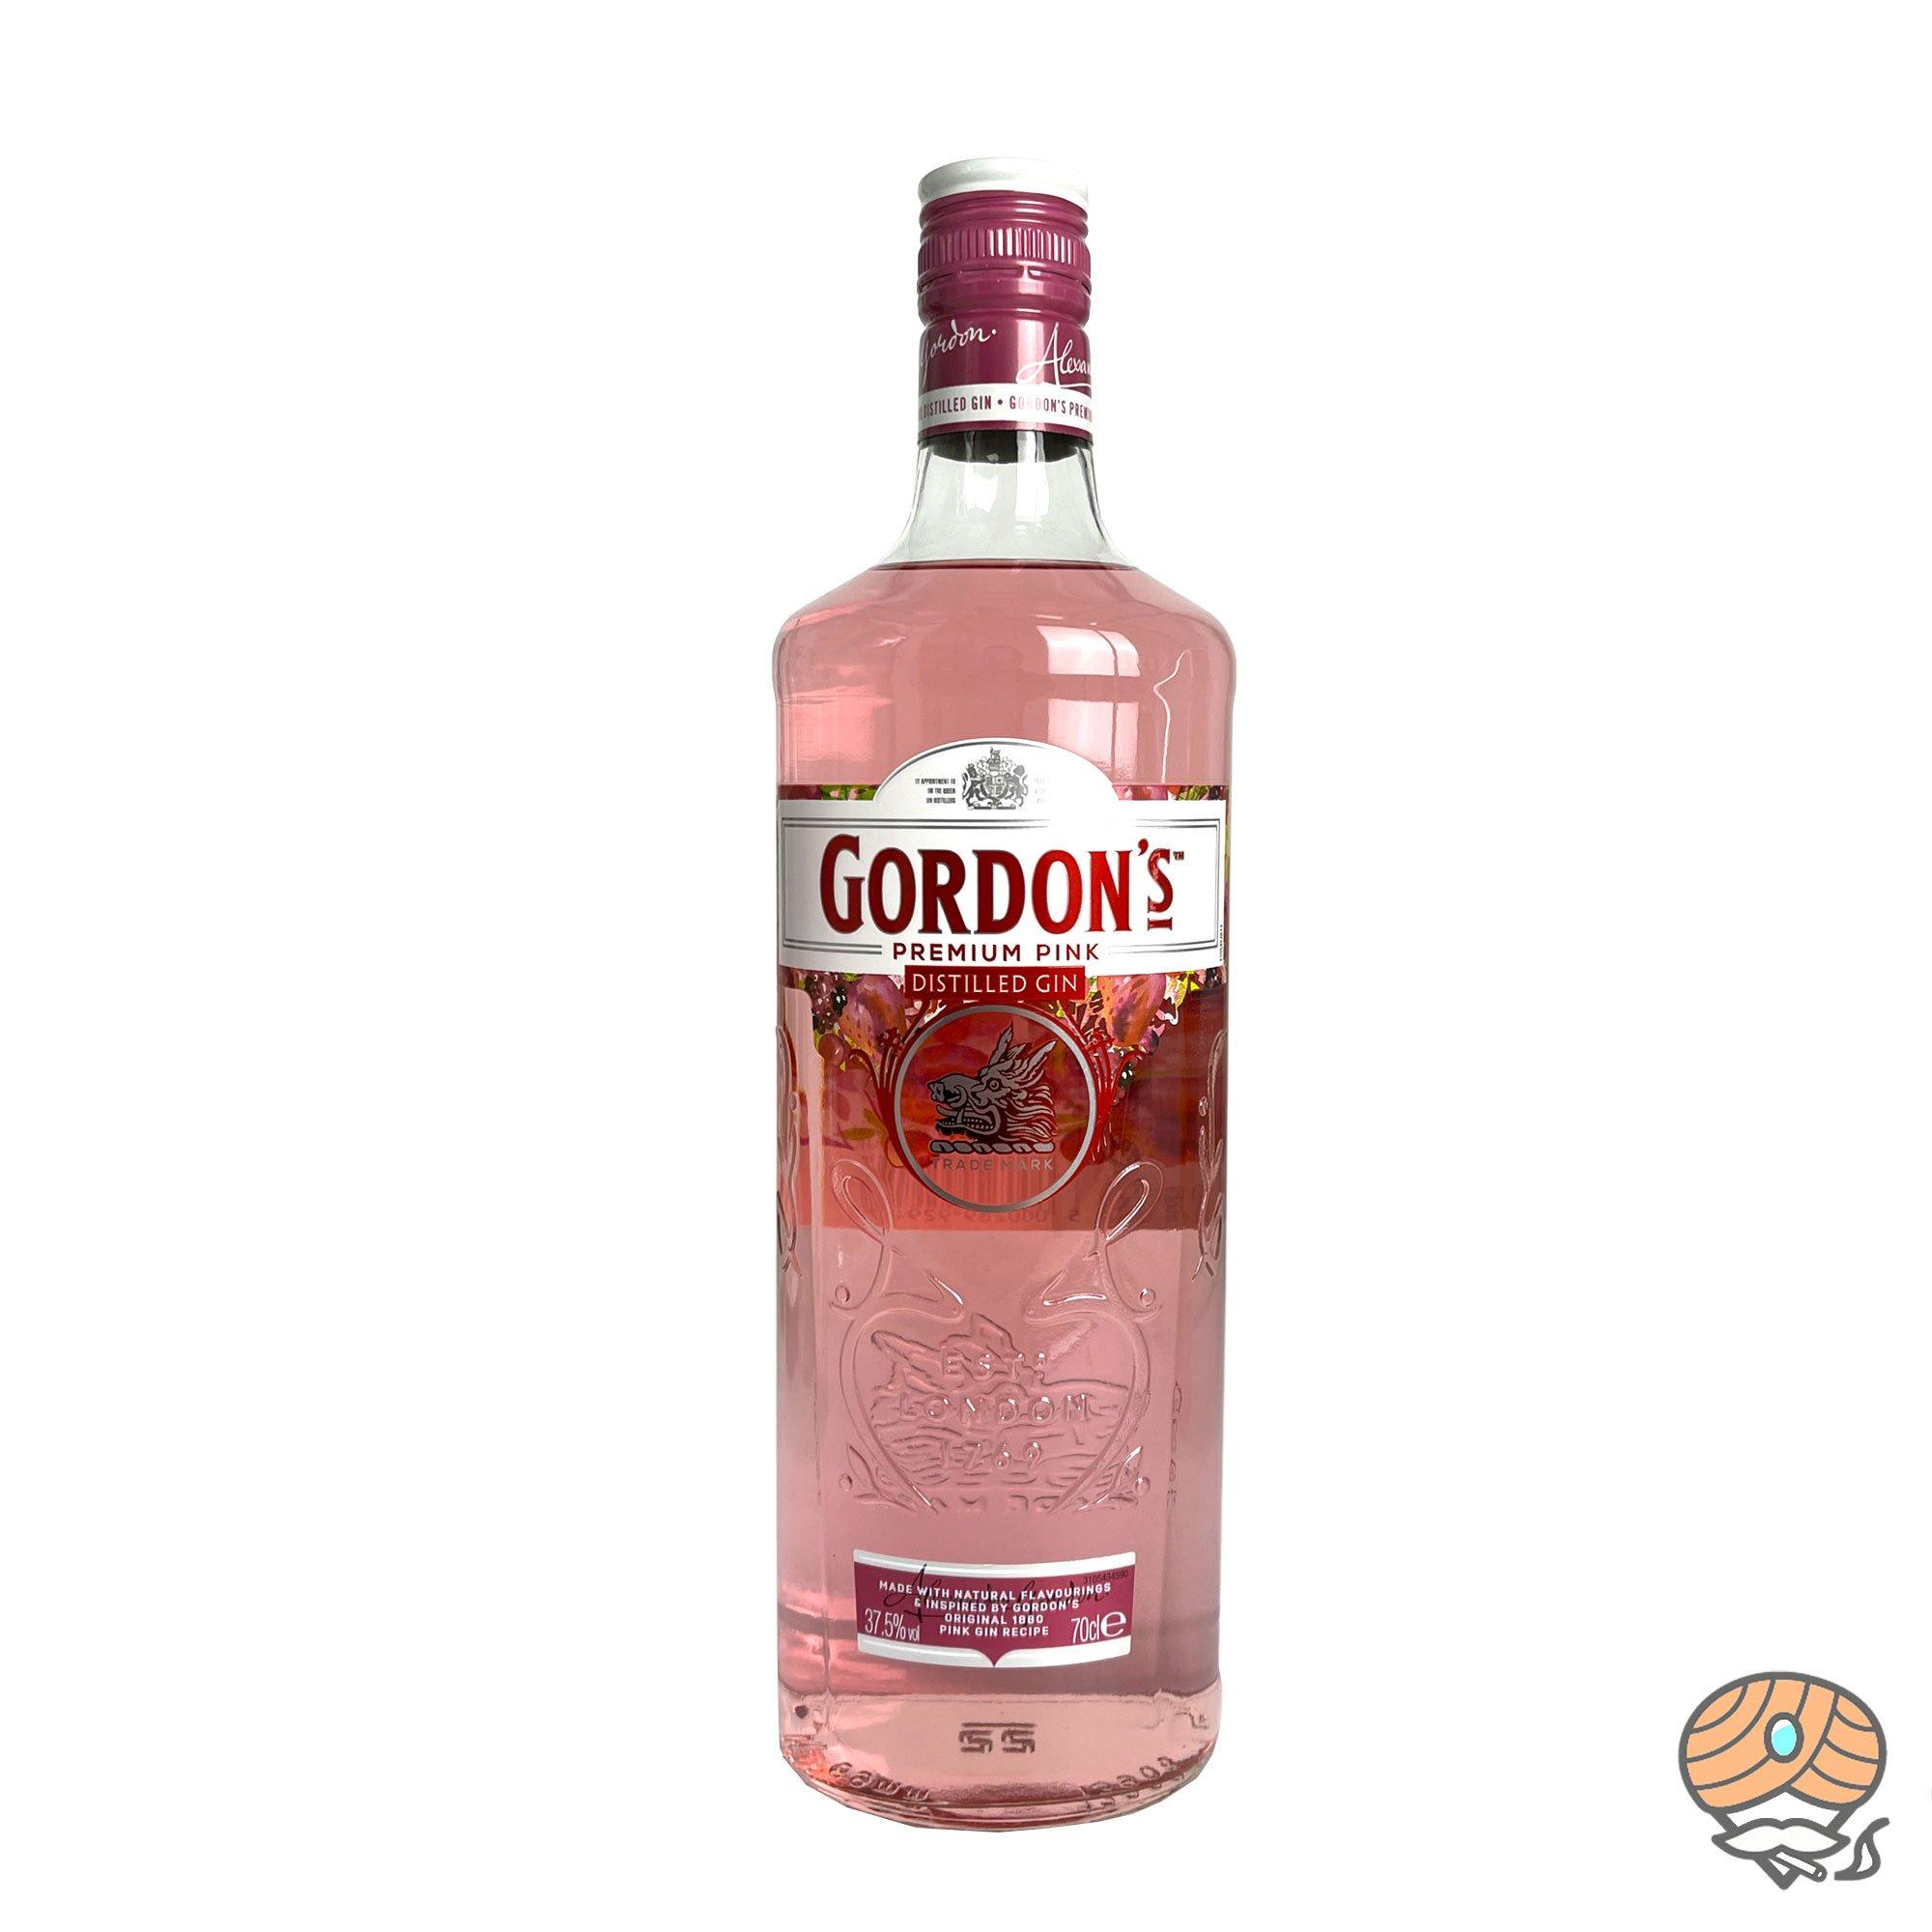 Gordon´s Premium Pink Gin 0,7l, alc. 37,5 Vol.-%